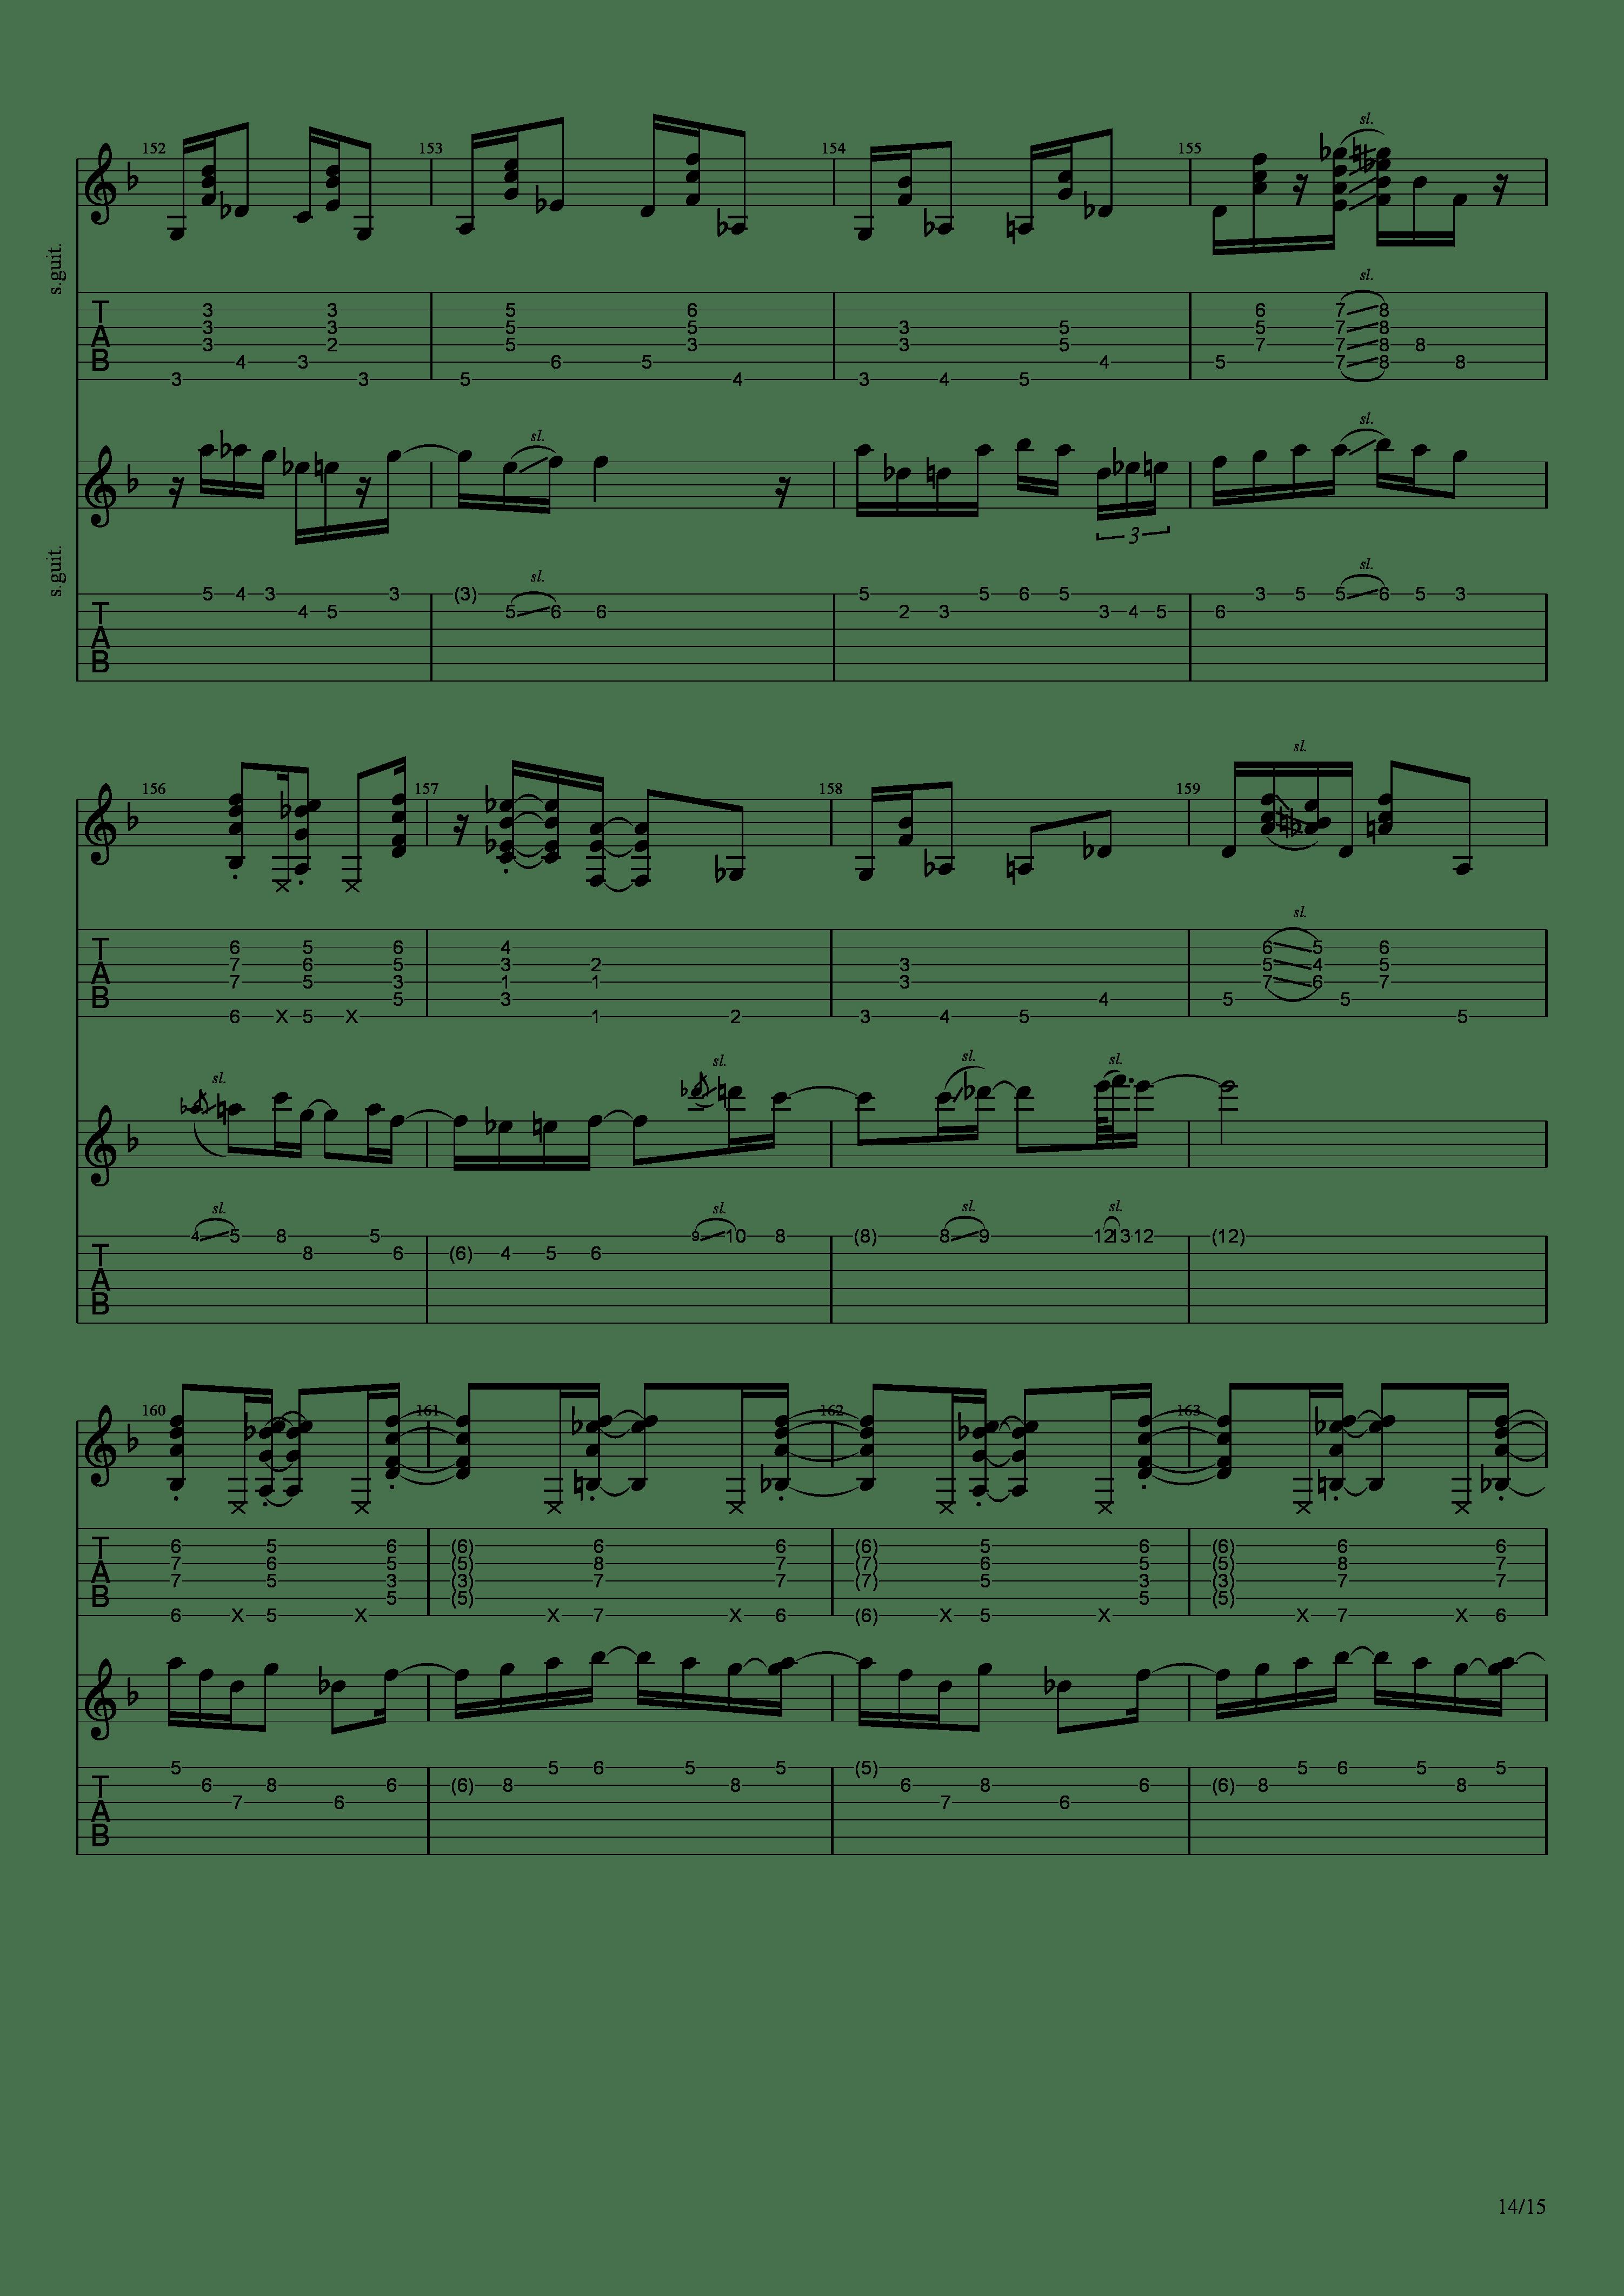 Labyrinth (松井佑贵&井草圣二)吉他谱14